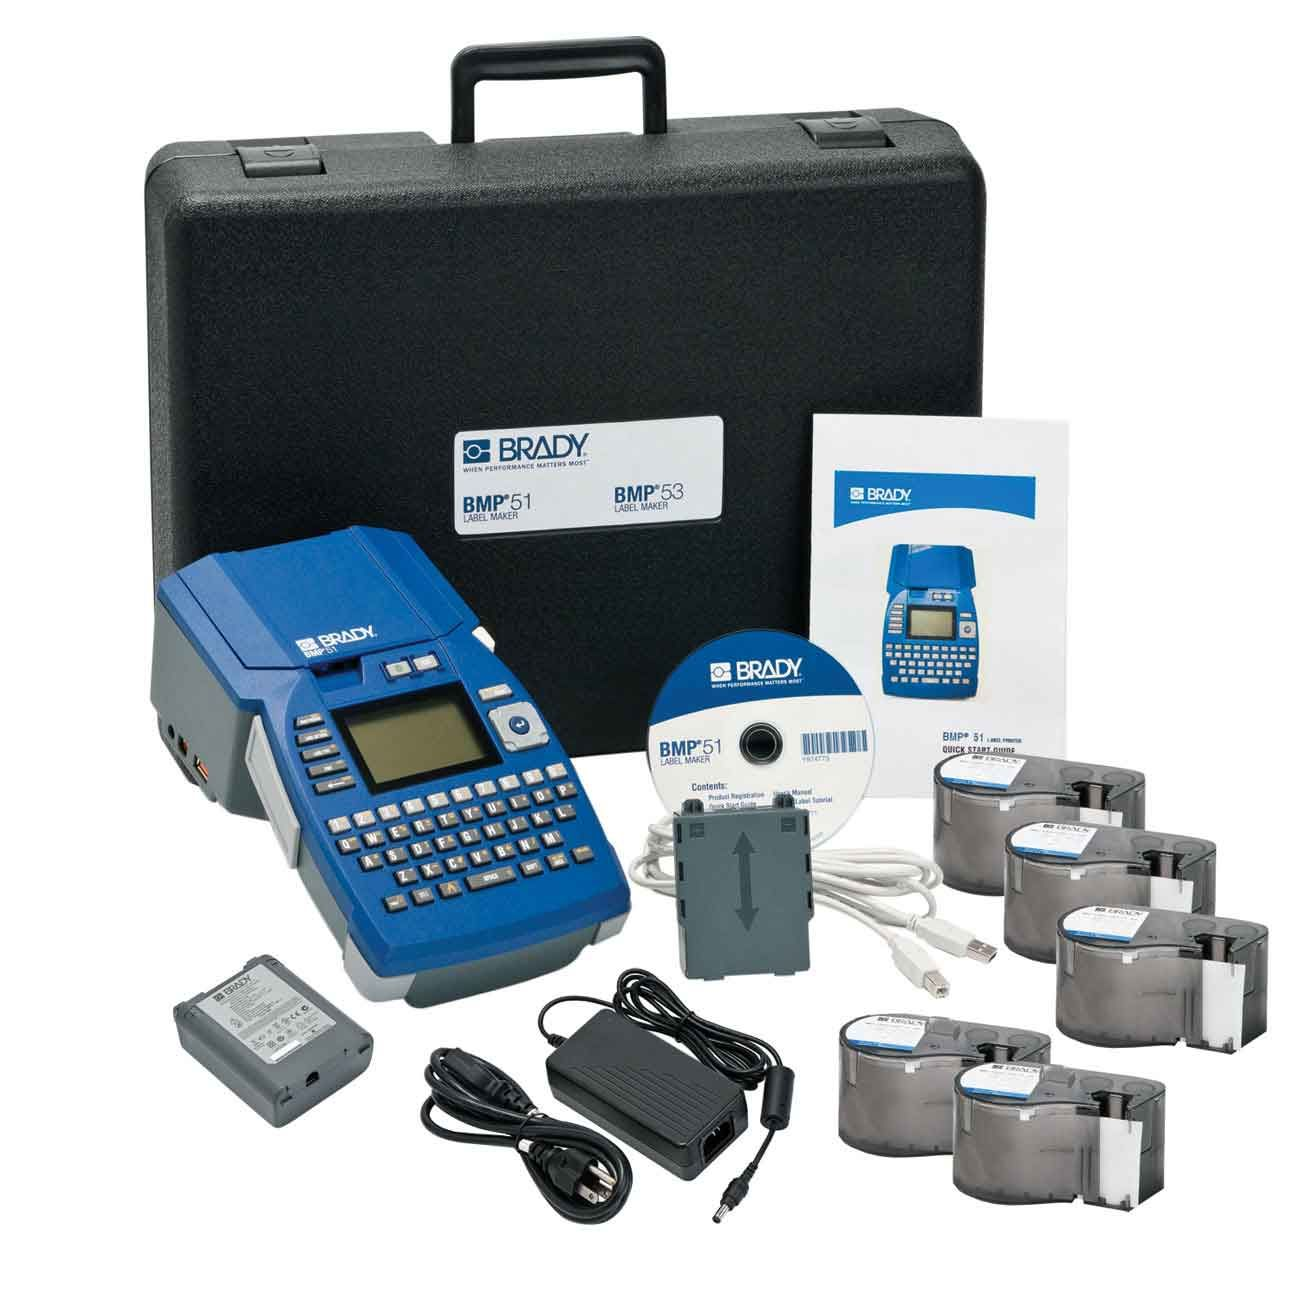 BMP51 Label Printer Lab Identification Starter Kit